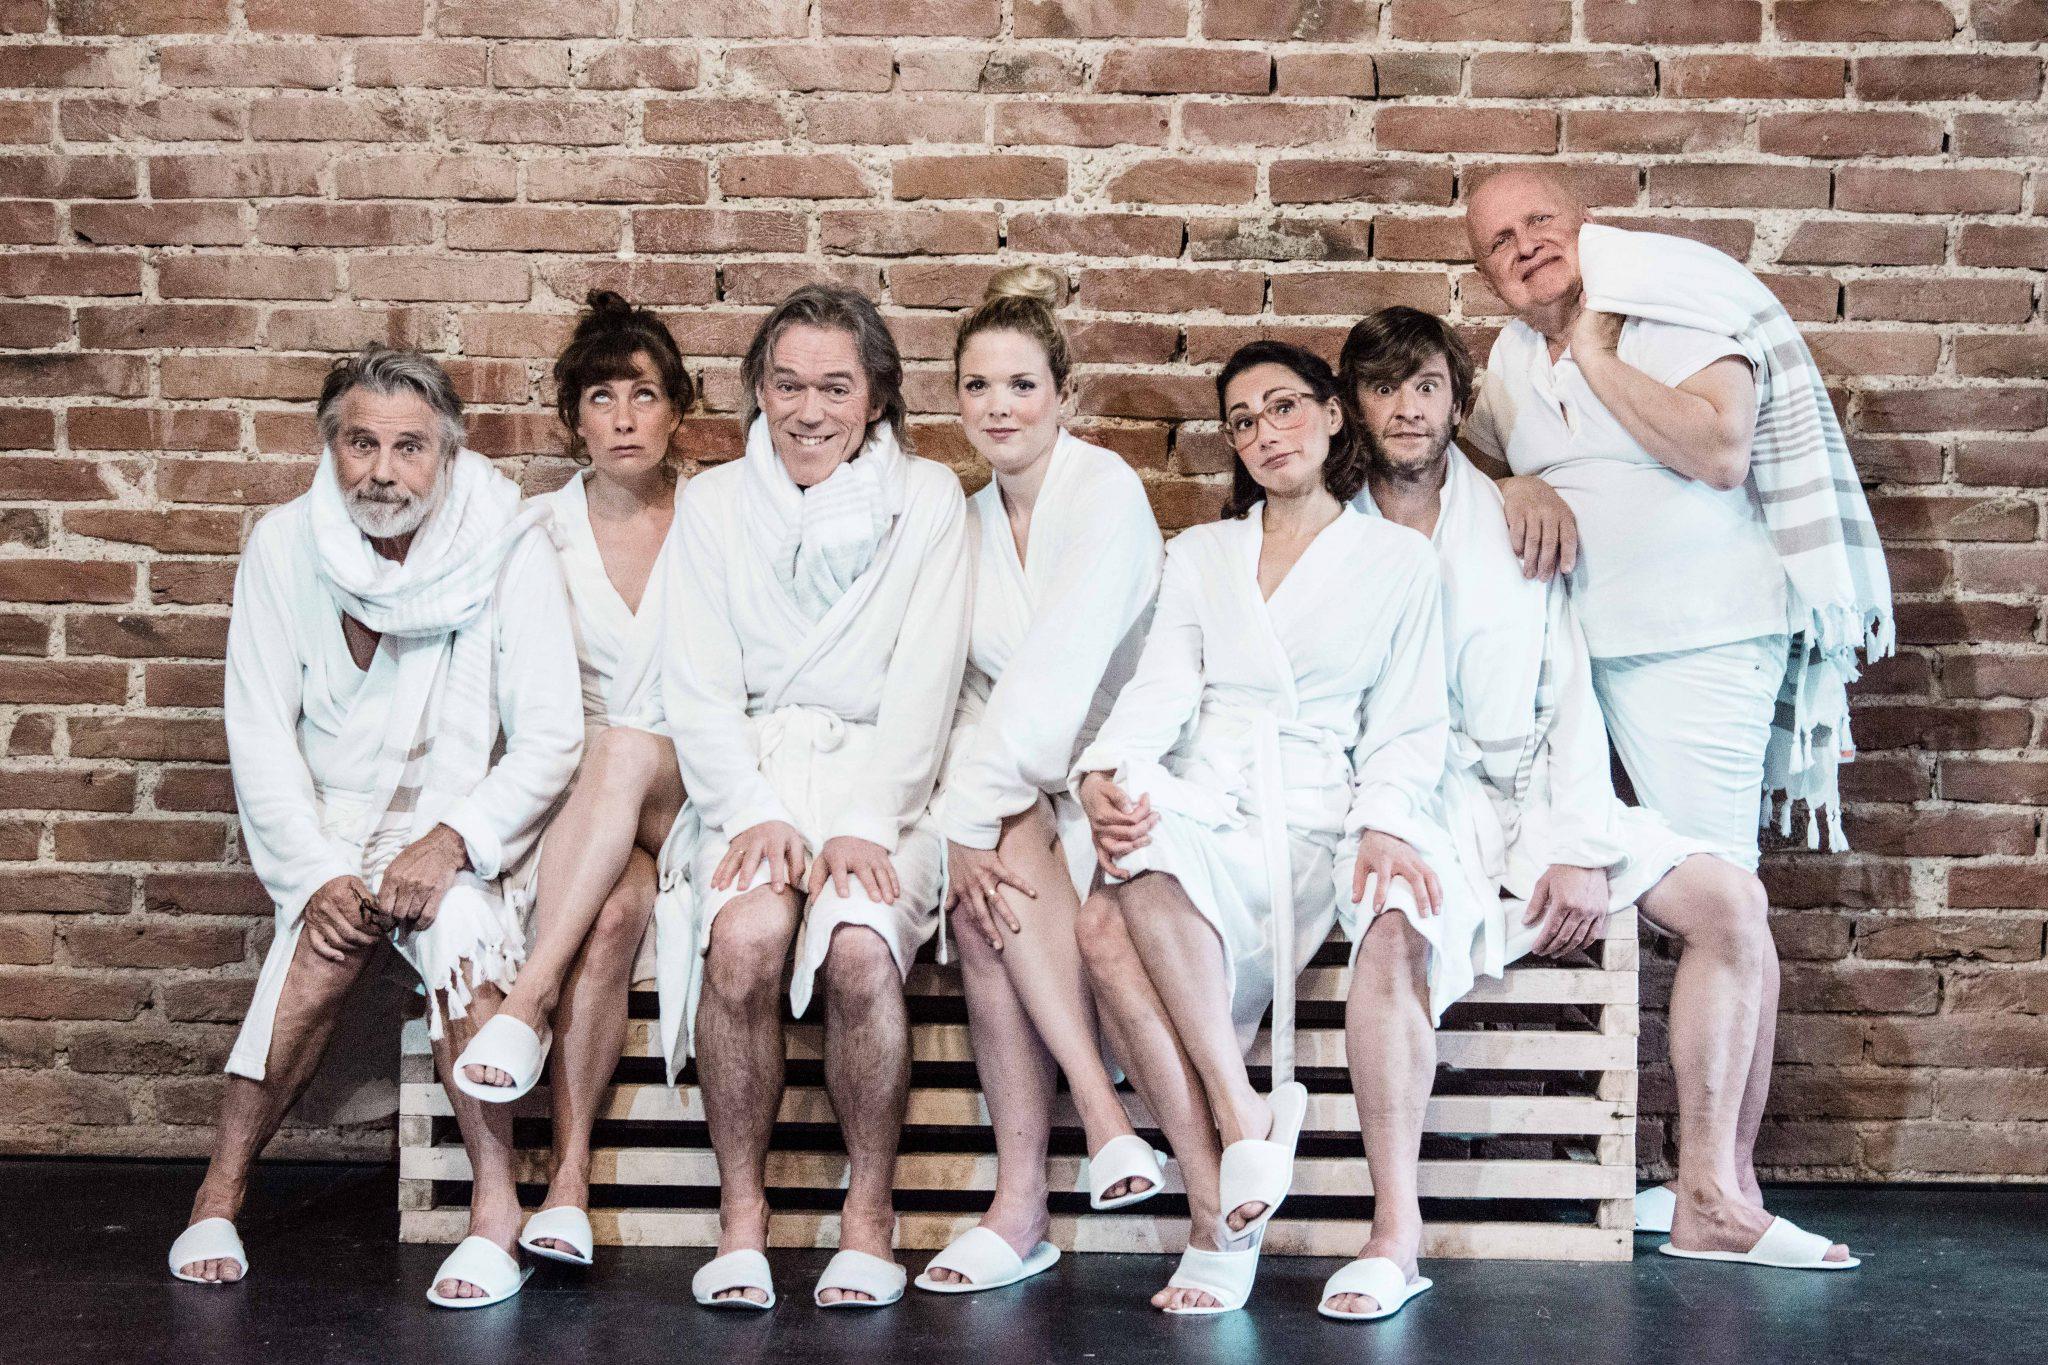 Adi Hirschal, Karola Niederhuber, Christian Deix, Sigrid Spörk, Sonja Romei, Ben Rufin, Thomas Mahn